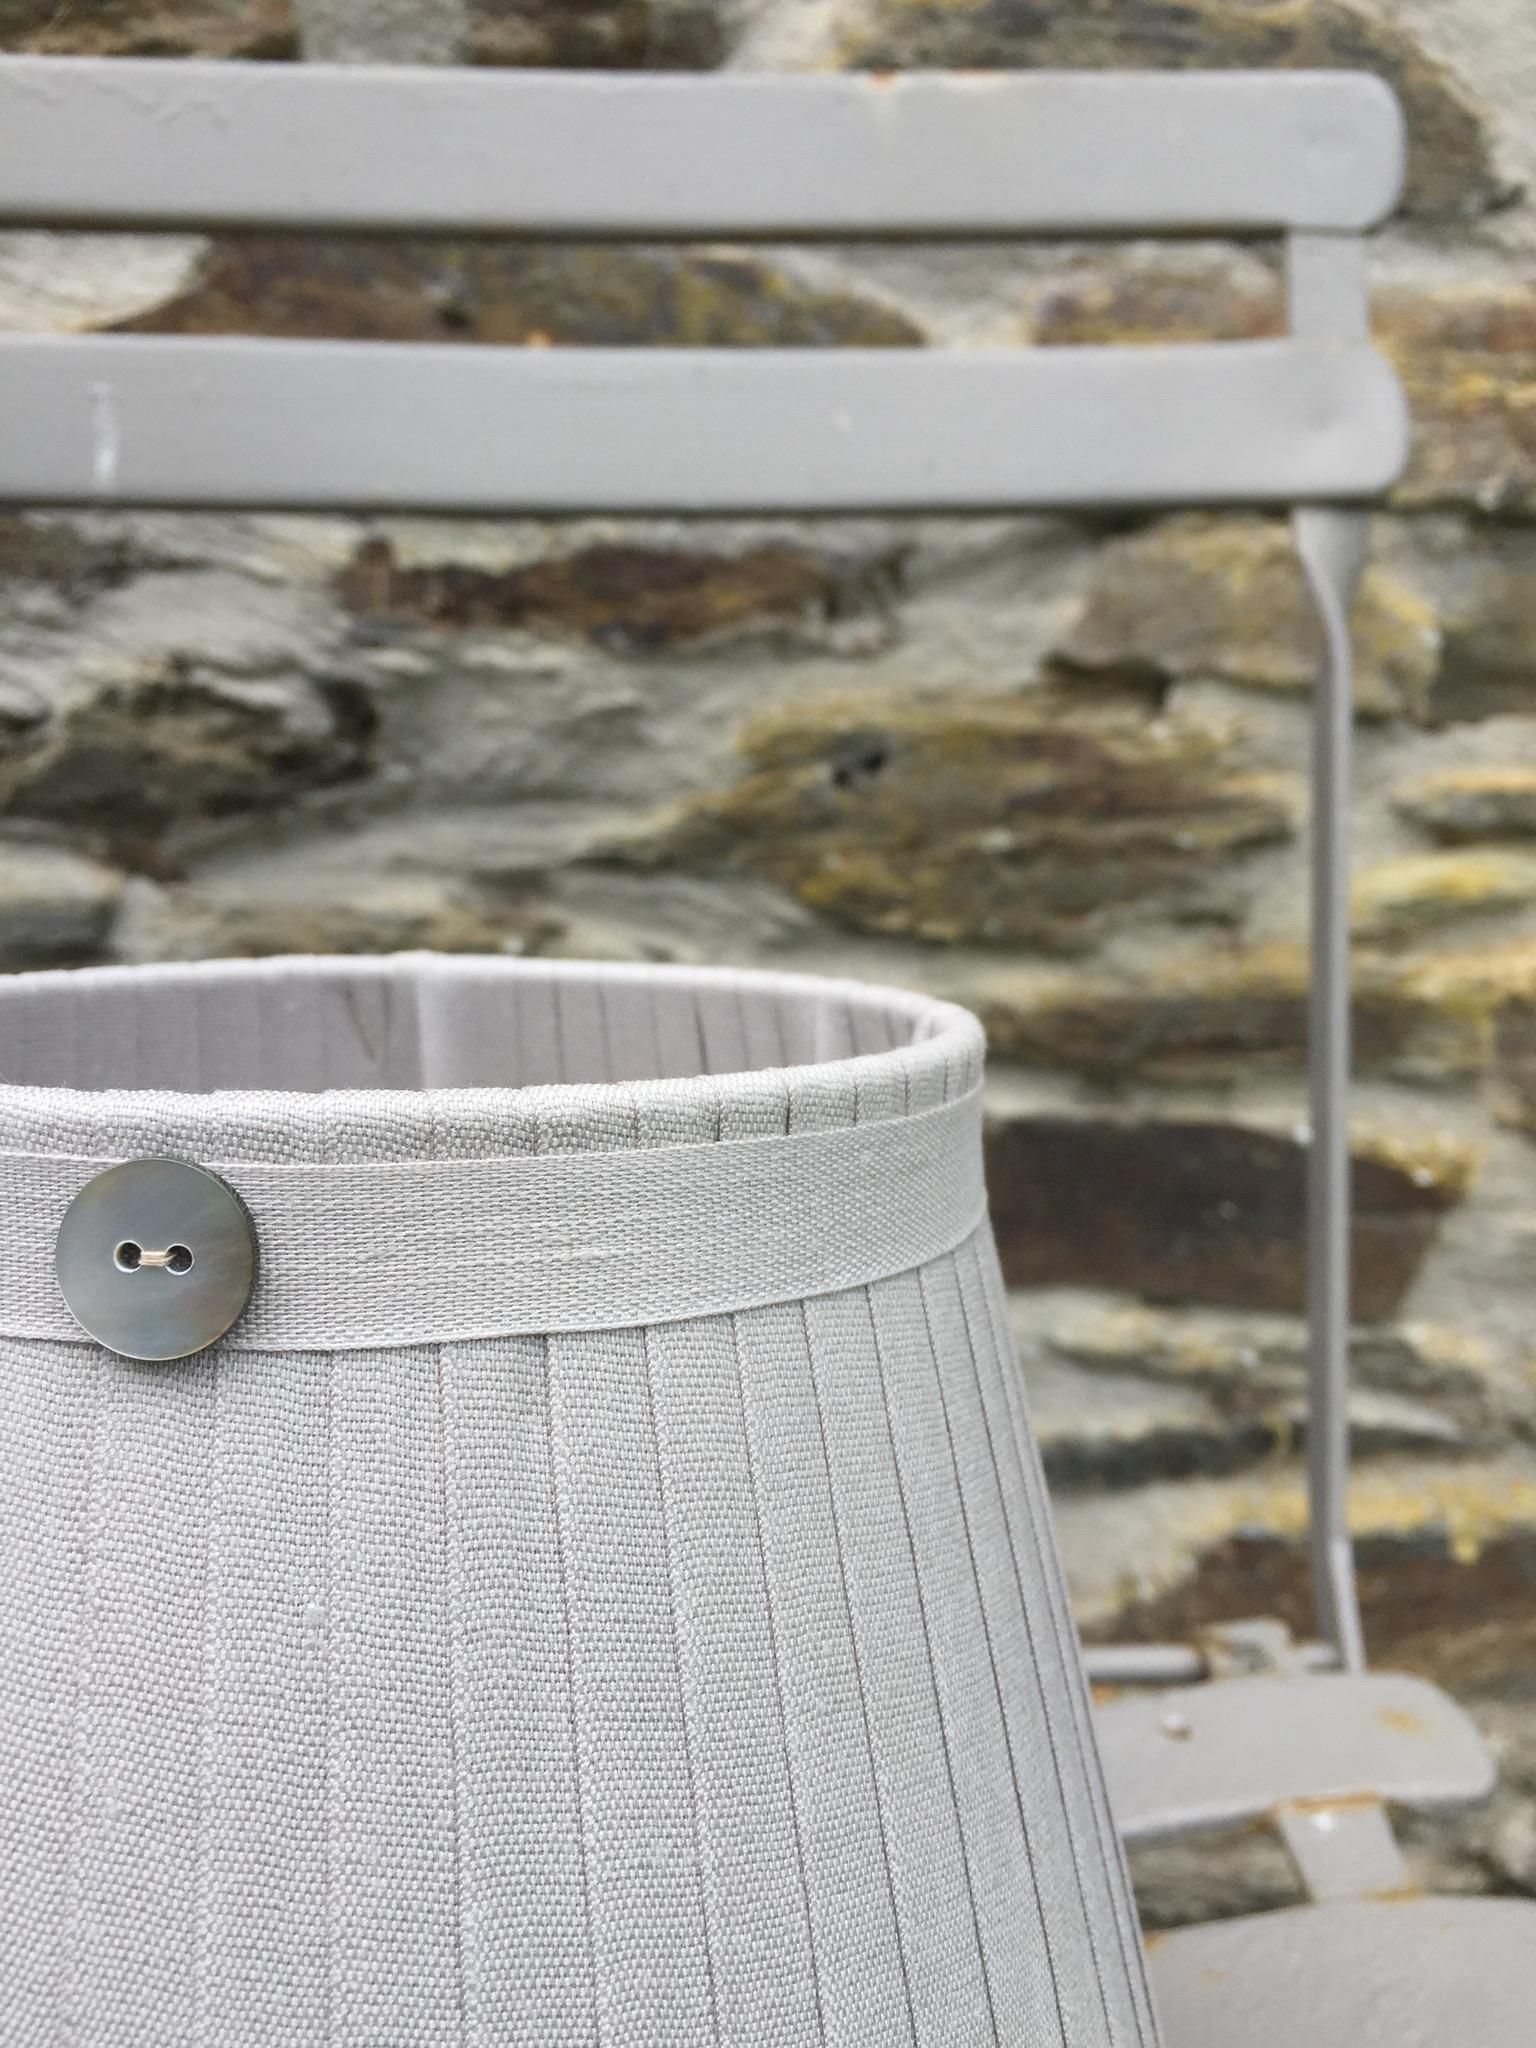 Grace Linen cool gray ribbon Lampshade button www.bay-design.co.uk